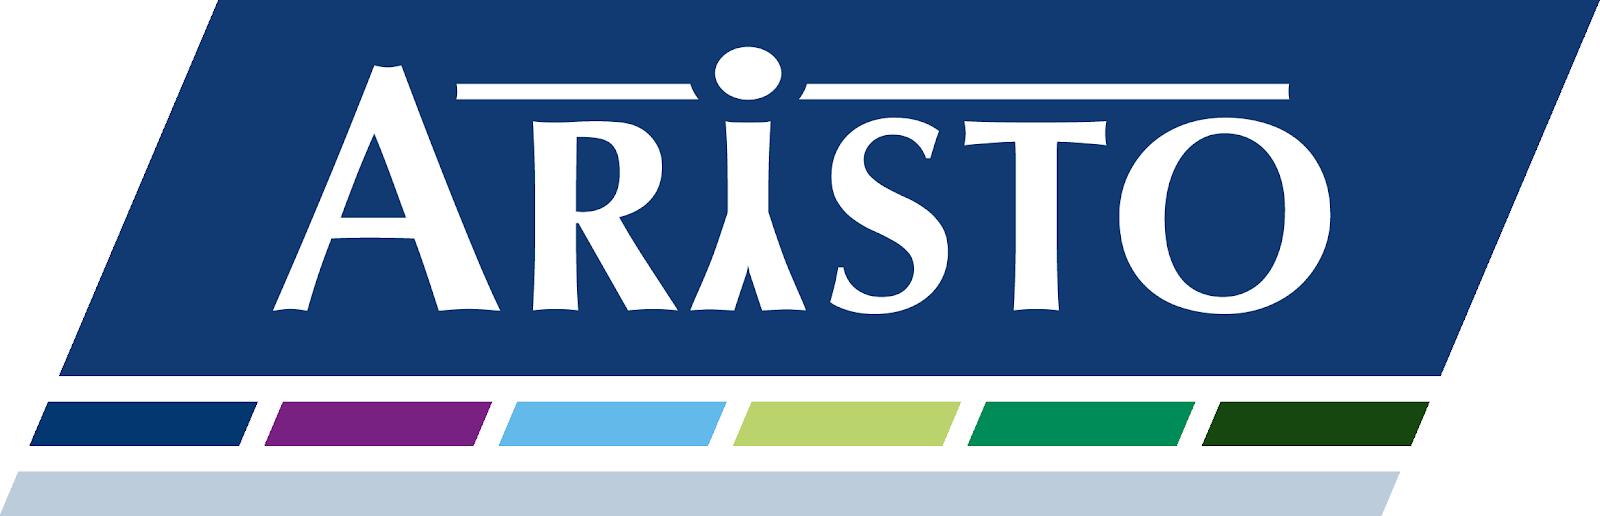 Aristo Pharma Iberia S.L